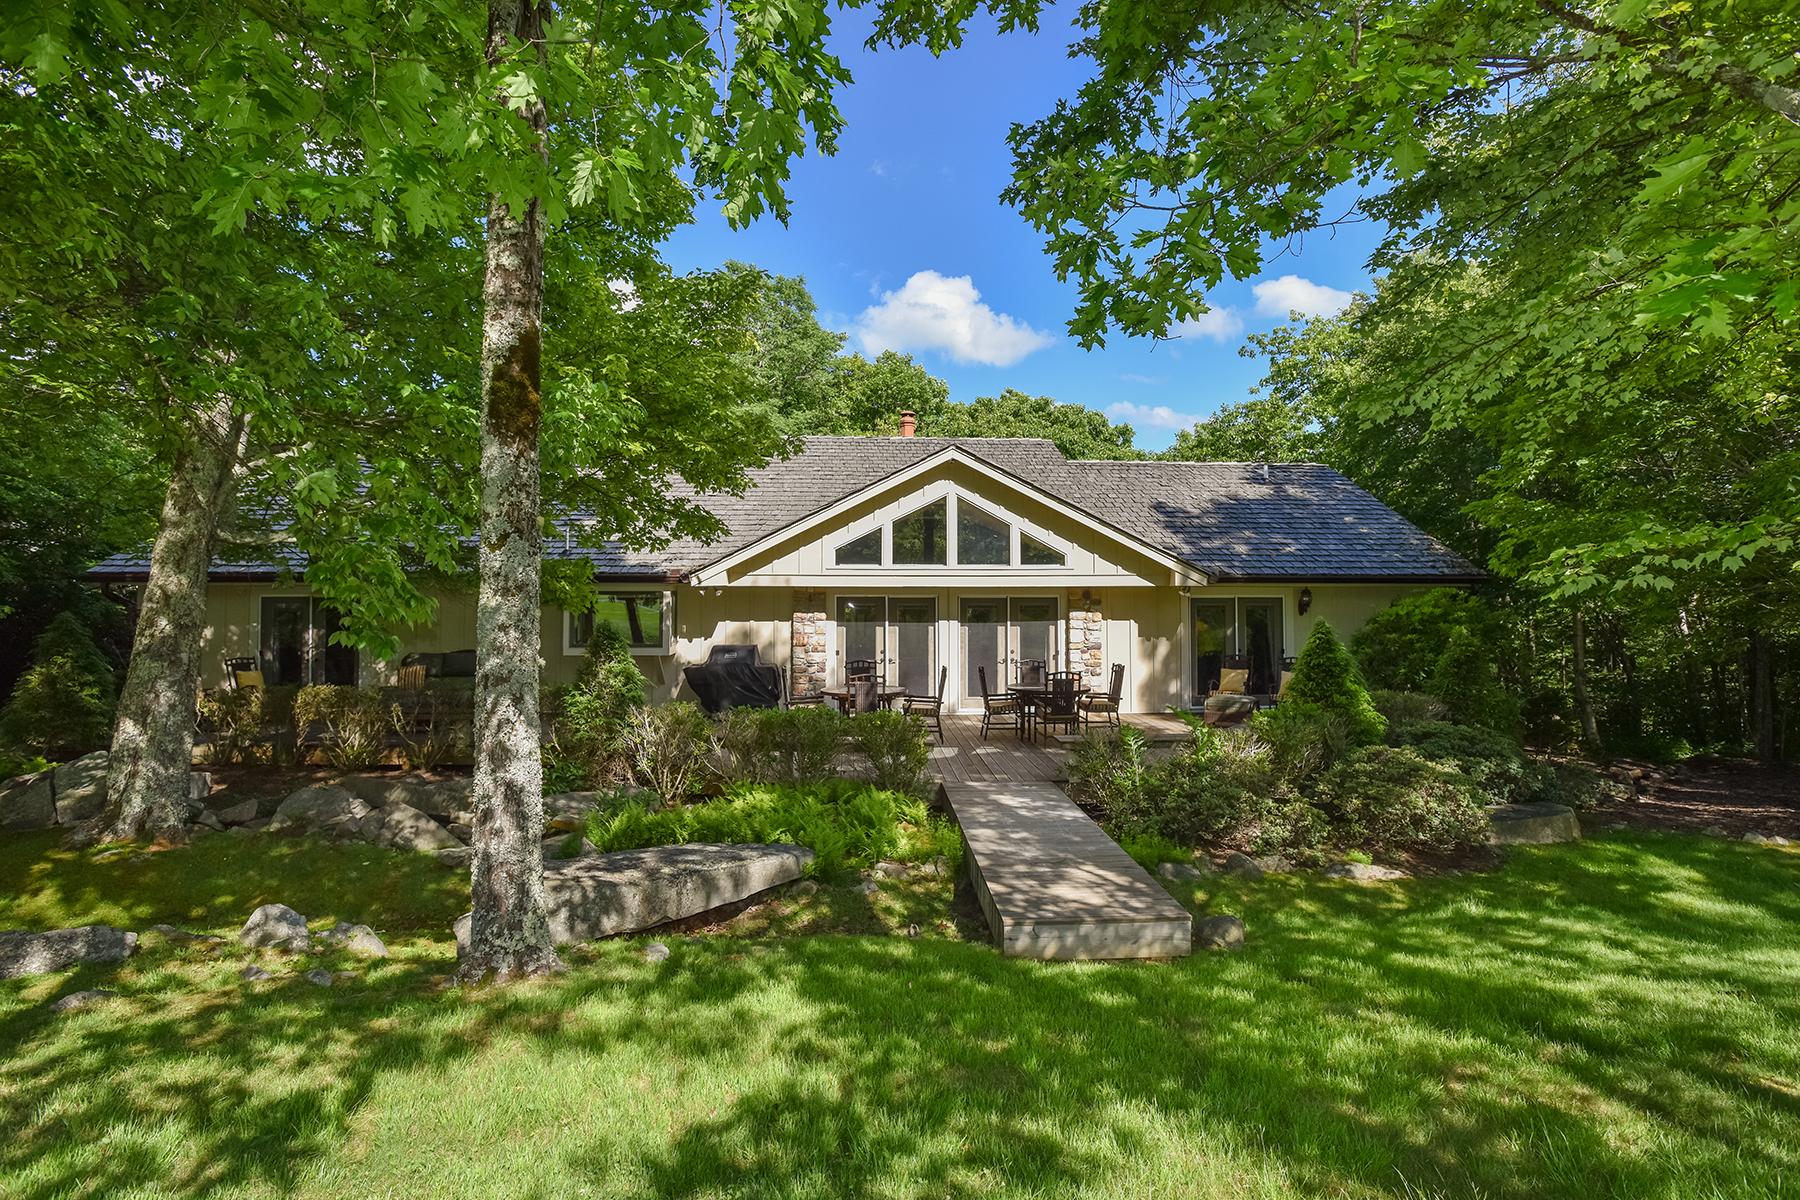 Single Family Home for Sale at LINVILLE RIDGE 404 Ridge Drive Linville, North Carolina, 28646 United States